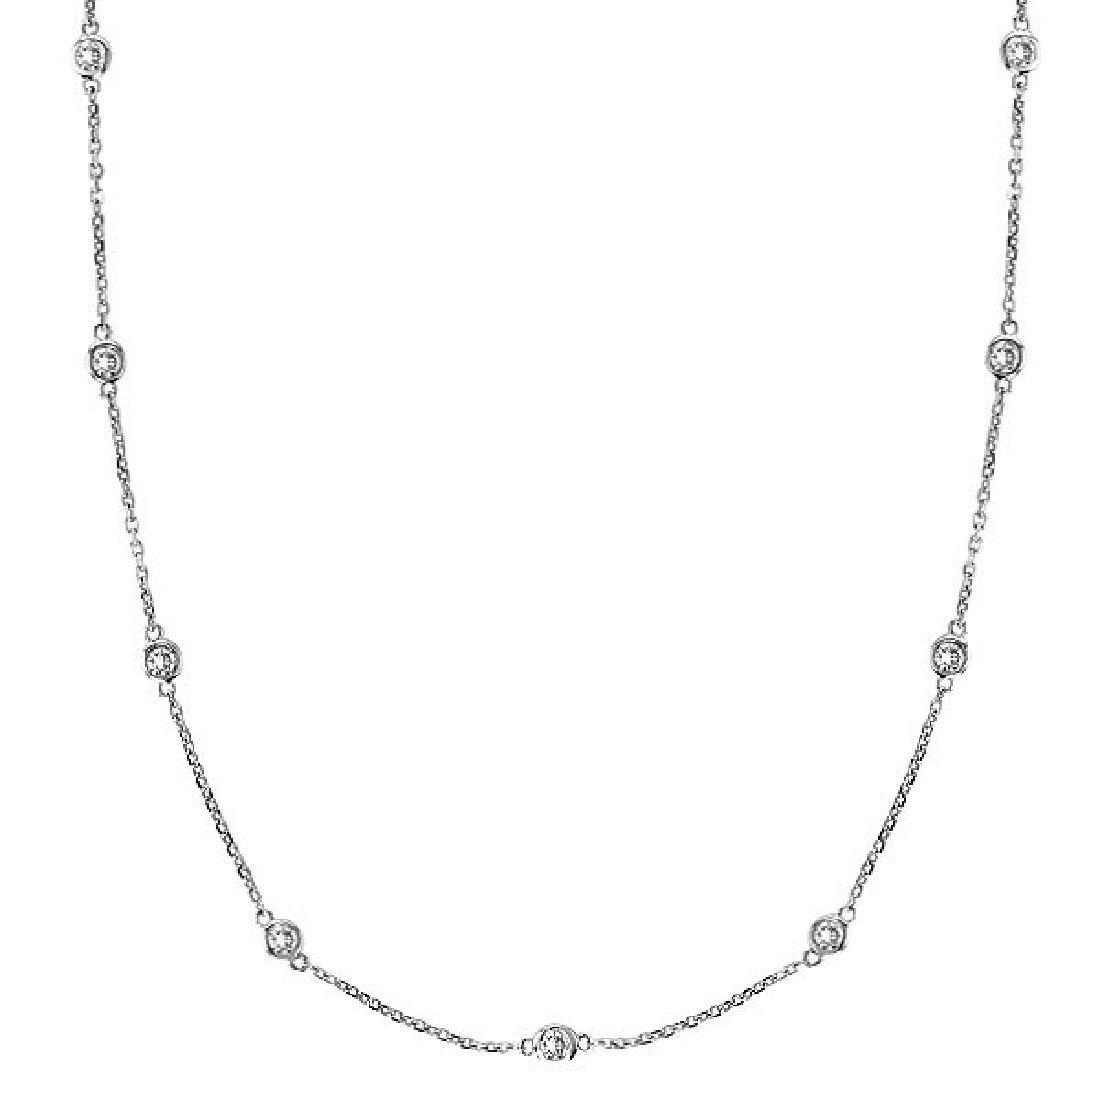 Diamonds by The Yard Bezel-Set Necklace in 14k White Go